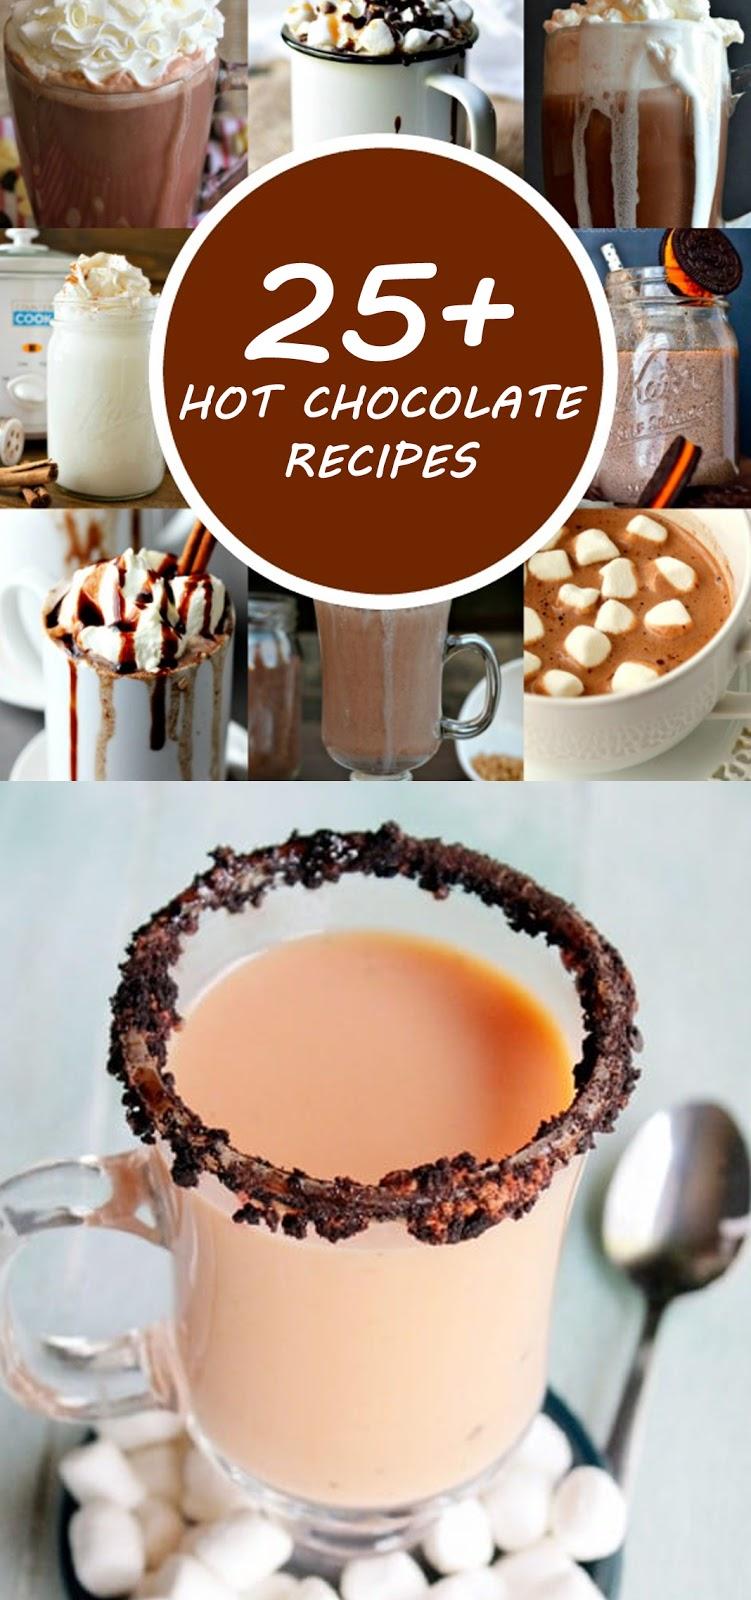 25+ Hot Chocolate Recipes